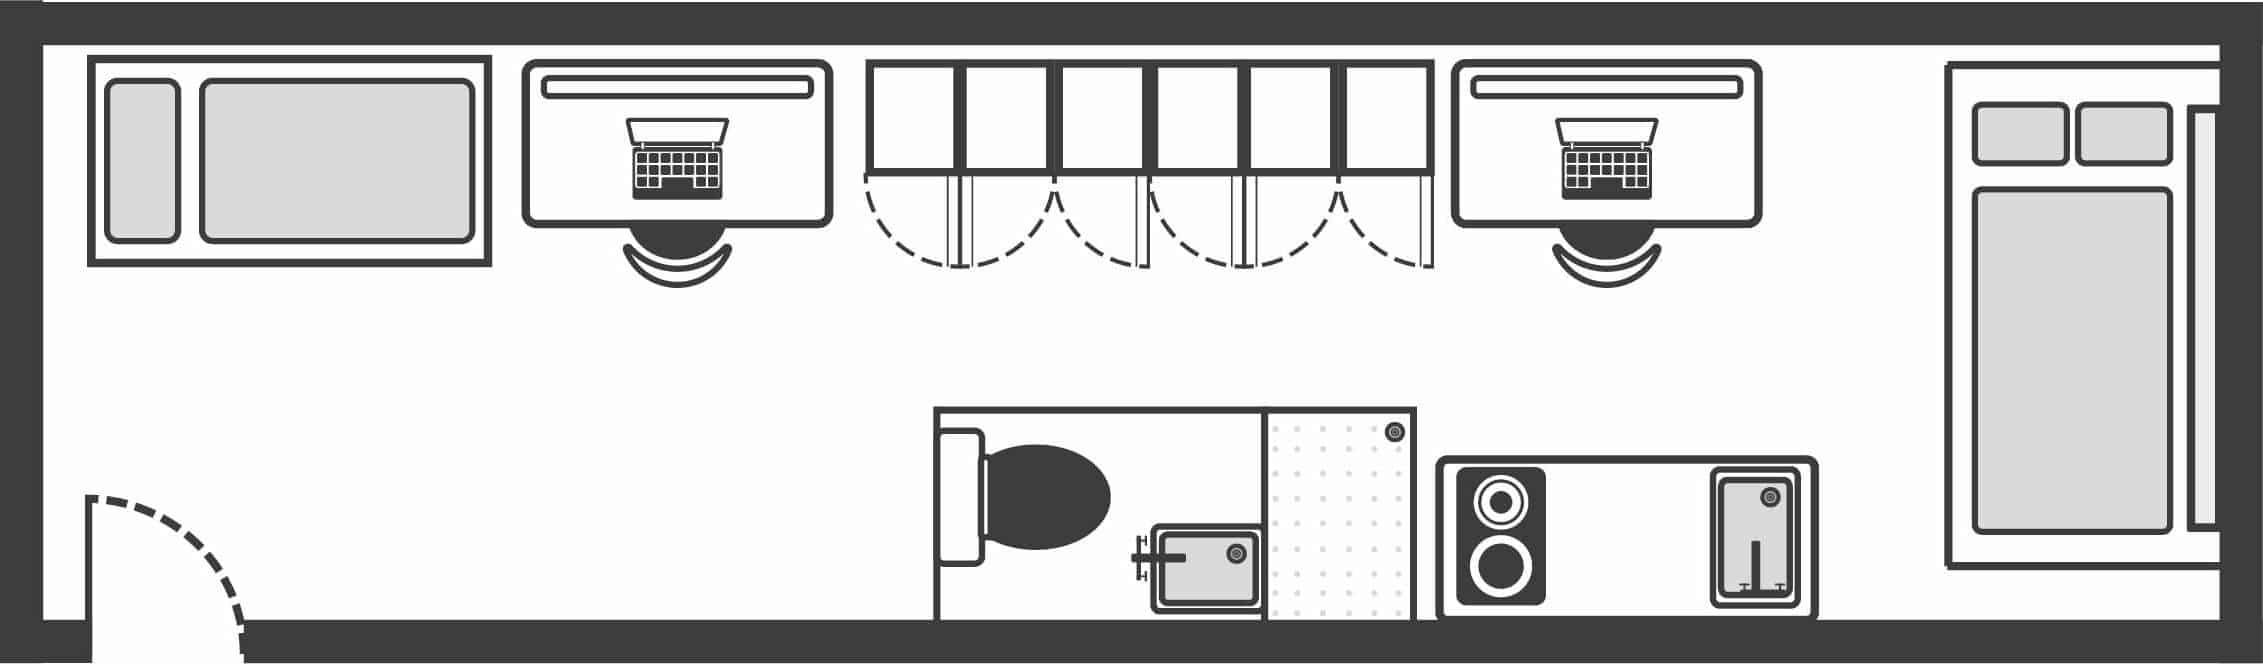 Kentish Town Suite Floor Plan 2